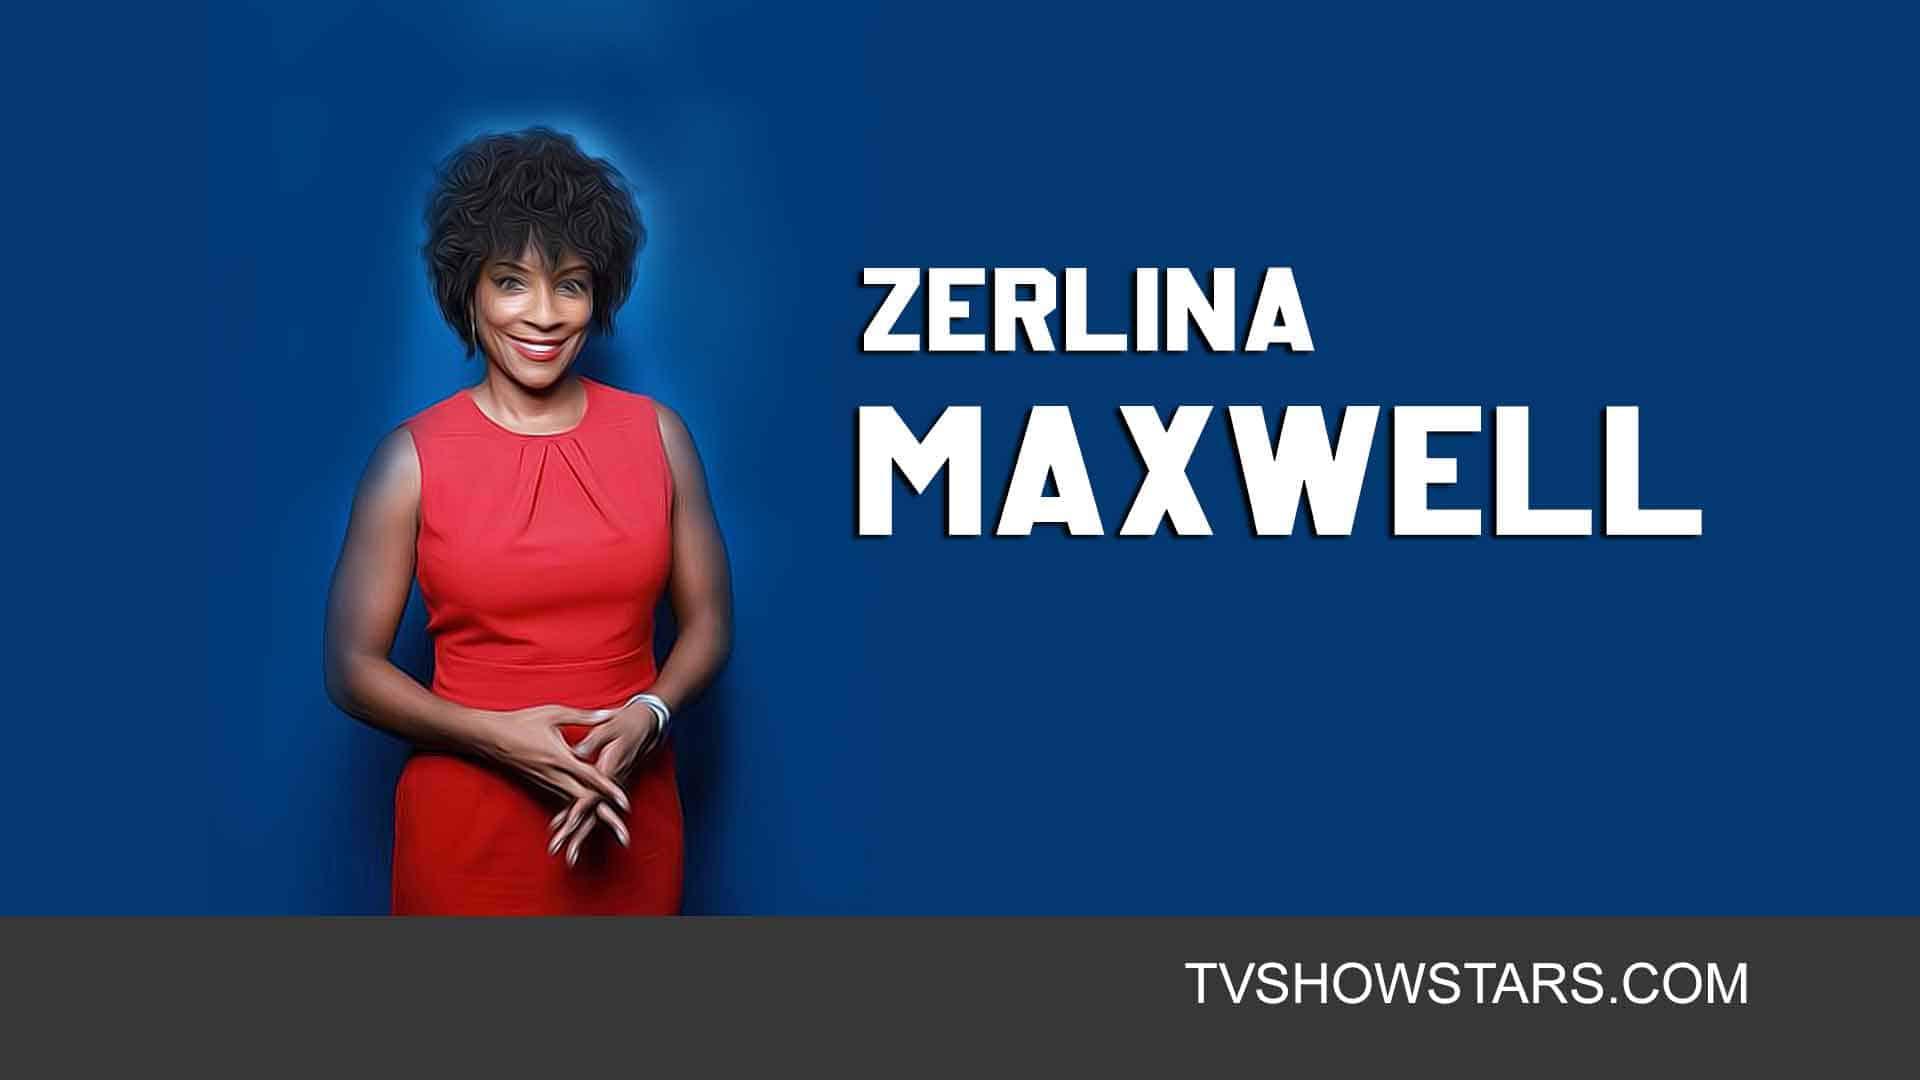 Zerlina Maxwell